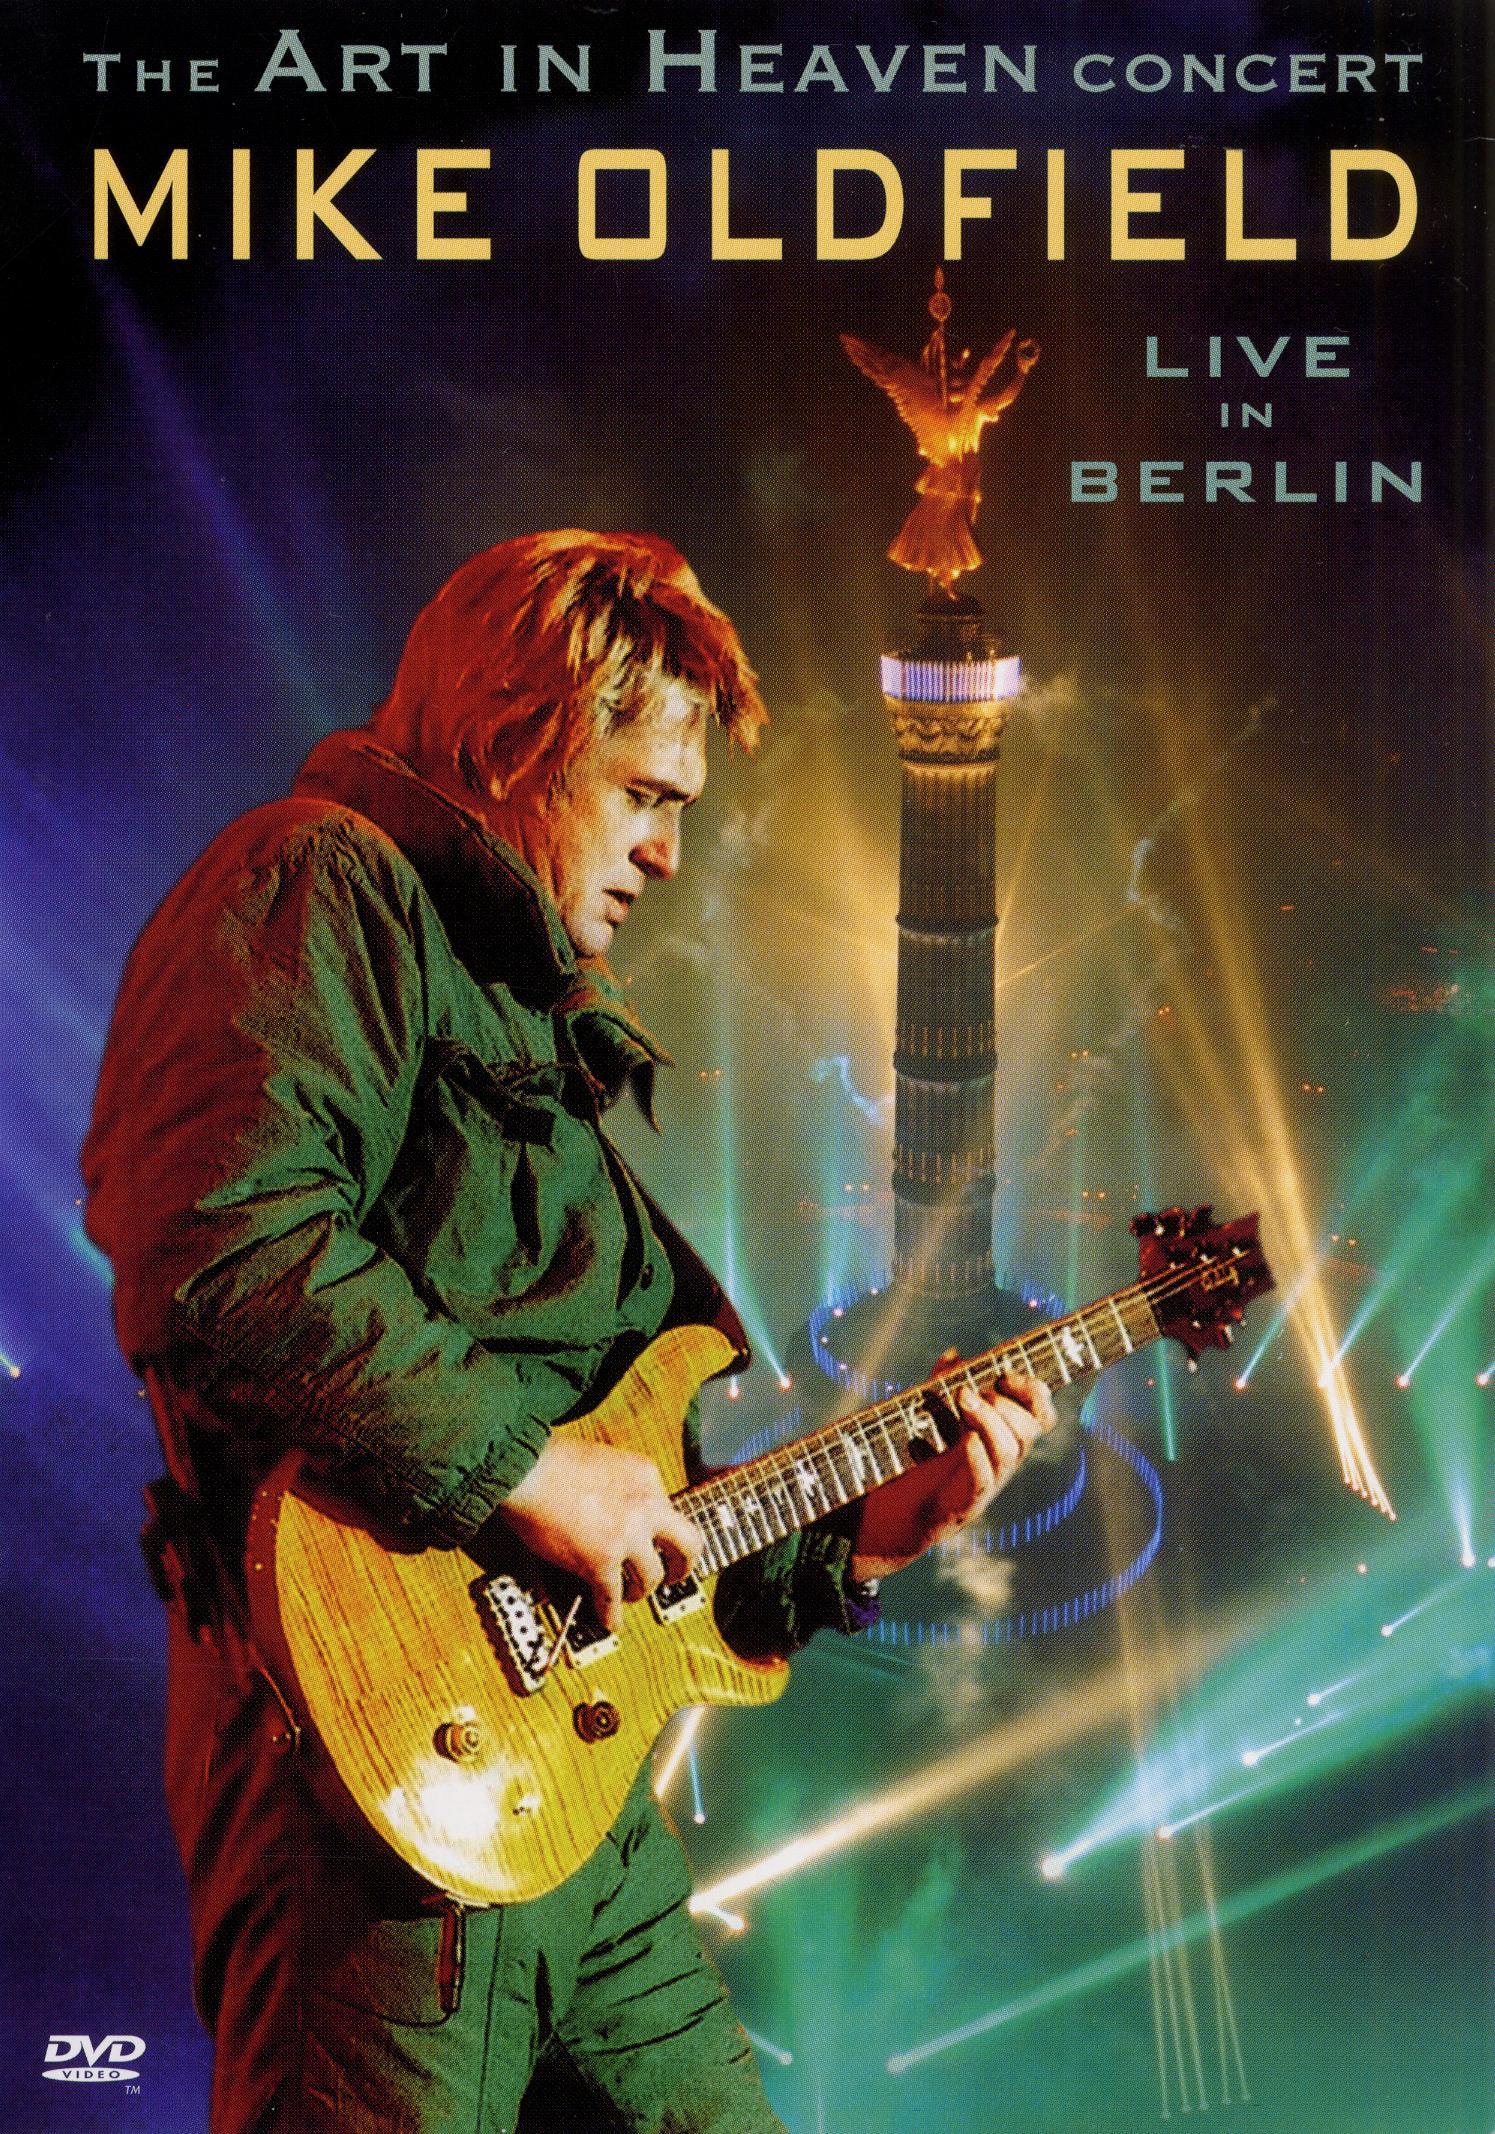 Mike Oldfield: The Art in Heaven Concert - Live in Berlin